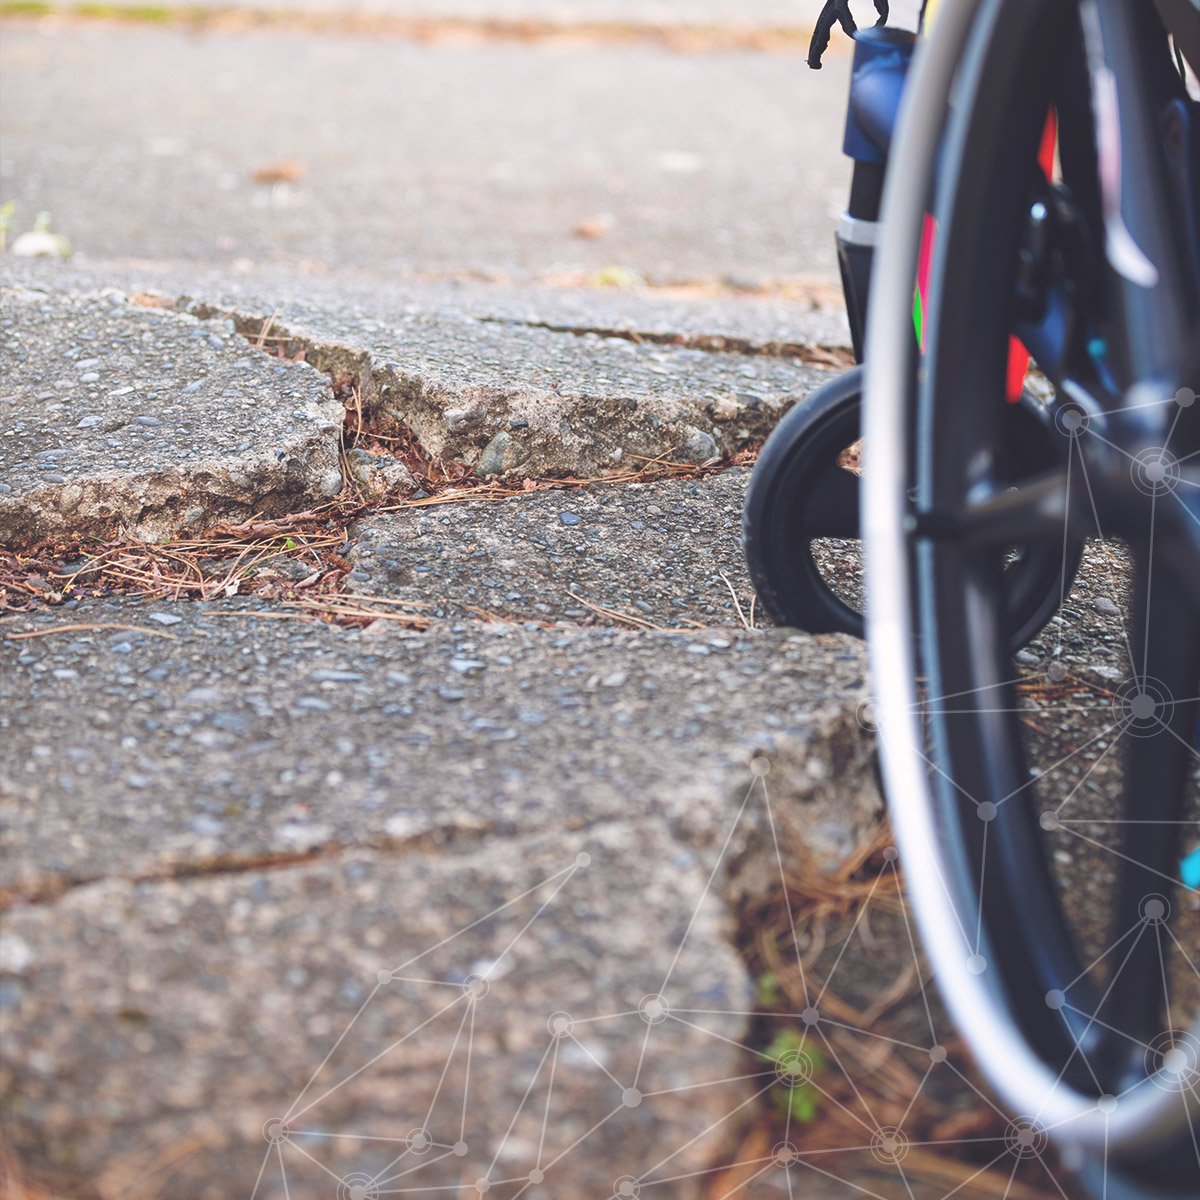 Sidewalk or pedestrian ramp that doesn't meet ADA compliance due to cracking.